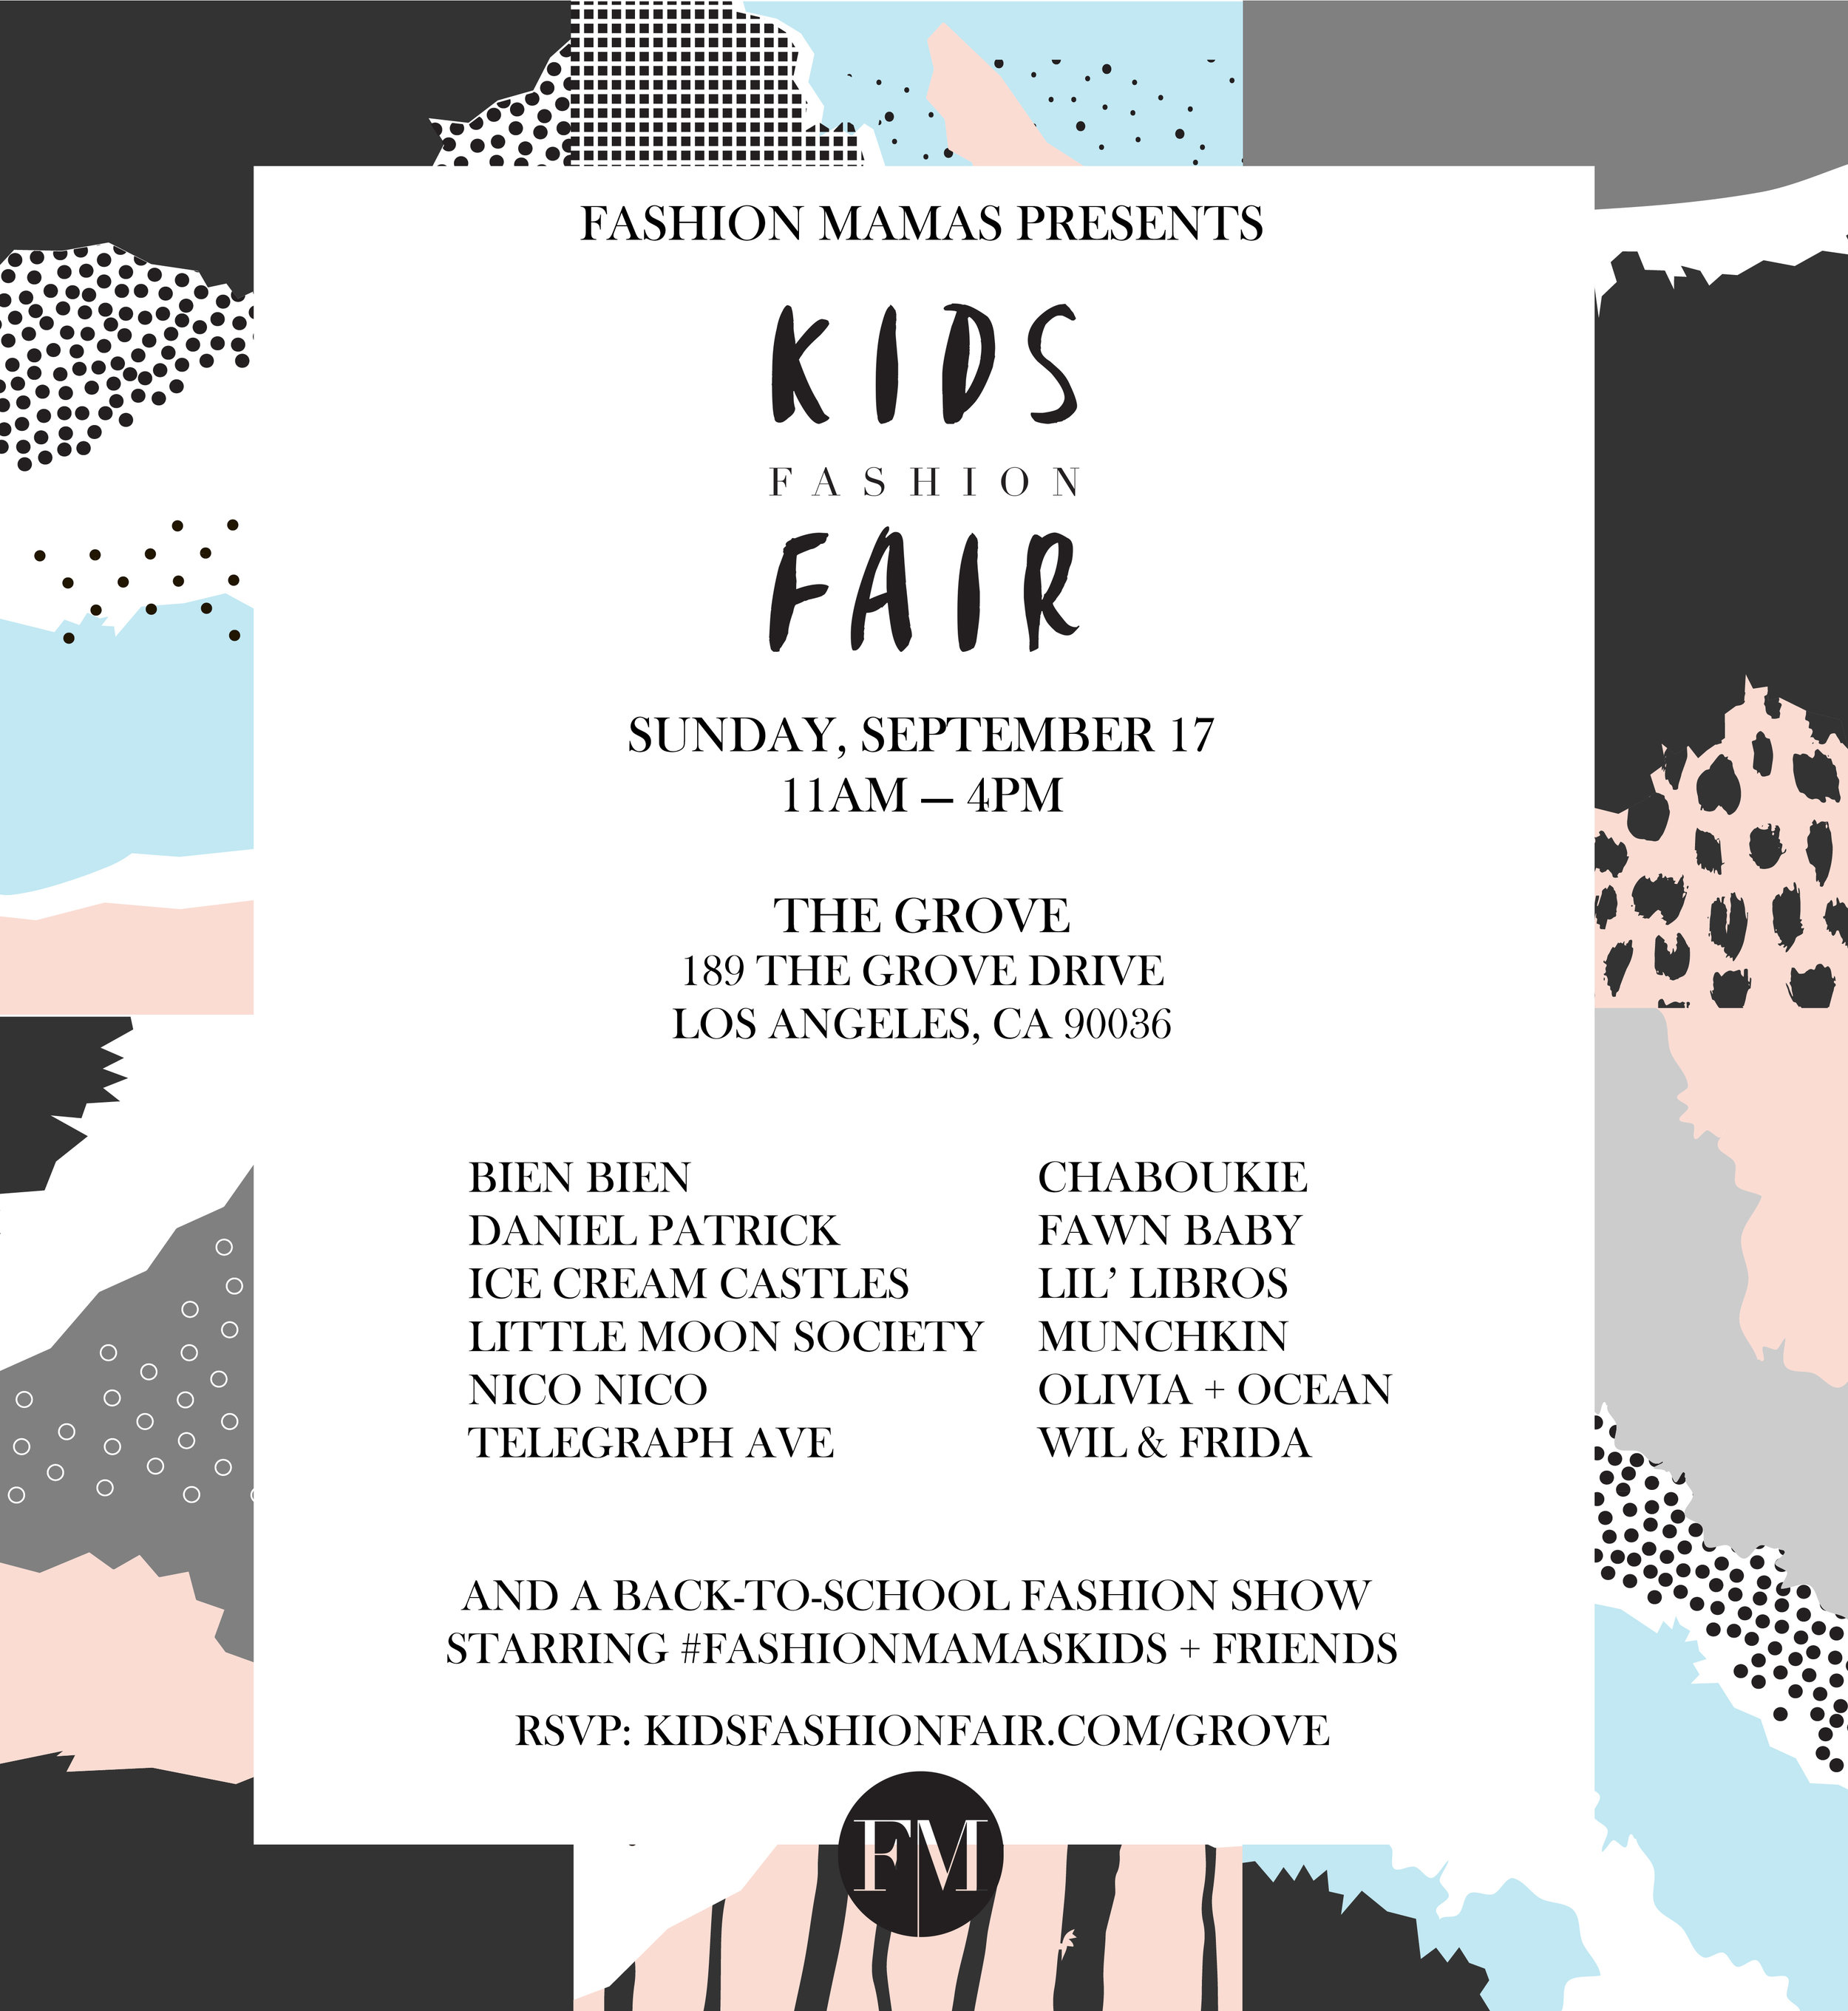 KFFLA-FALL2017-INVITE.jpg